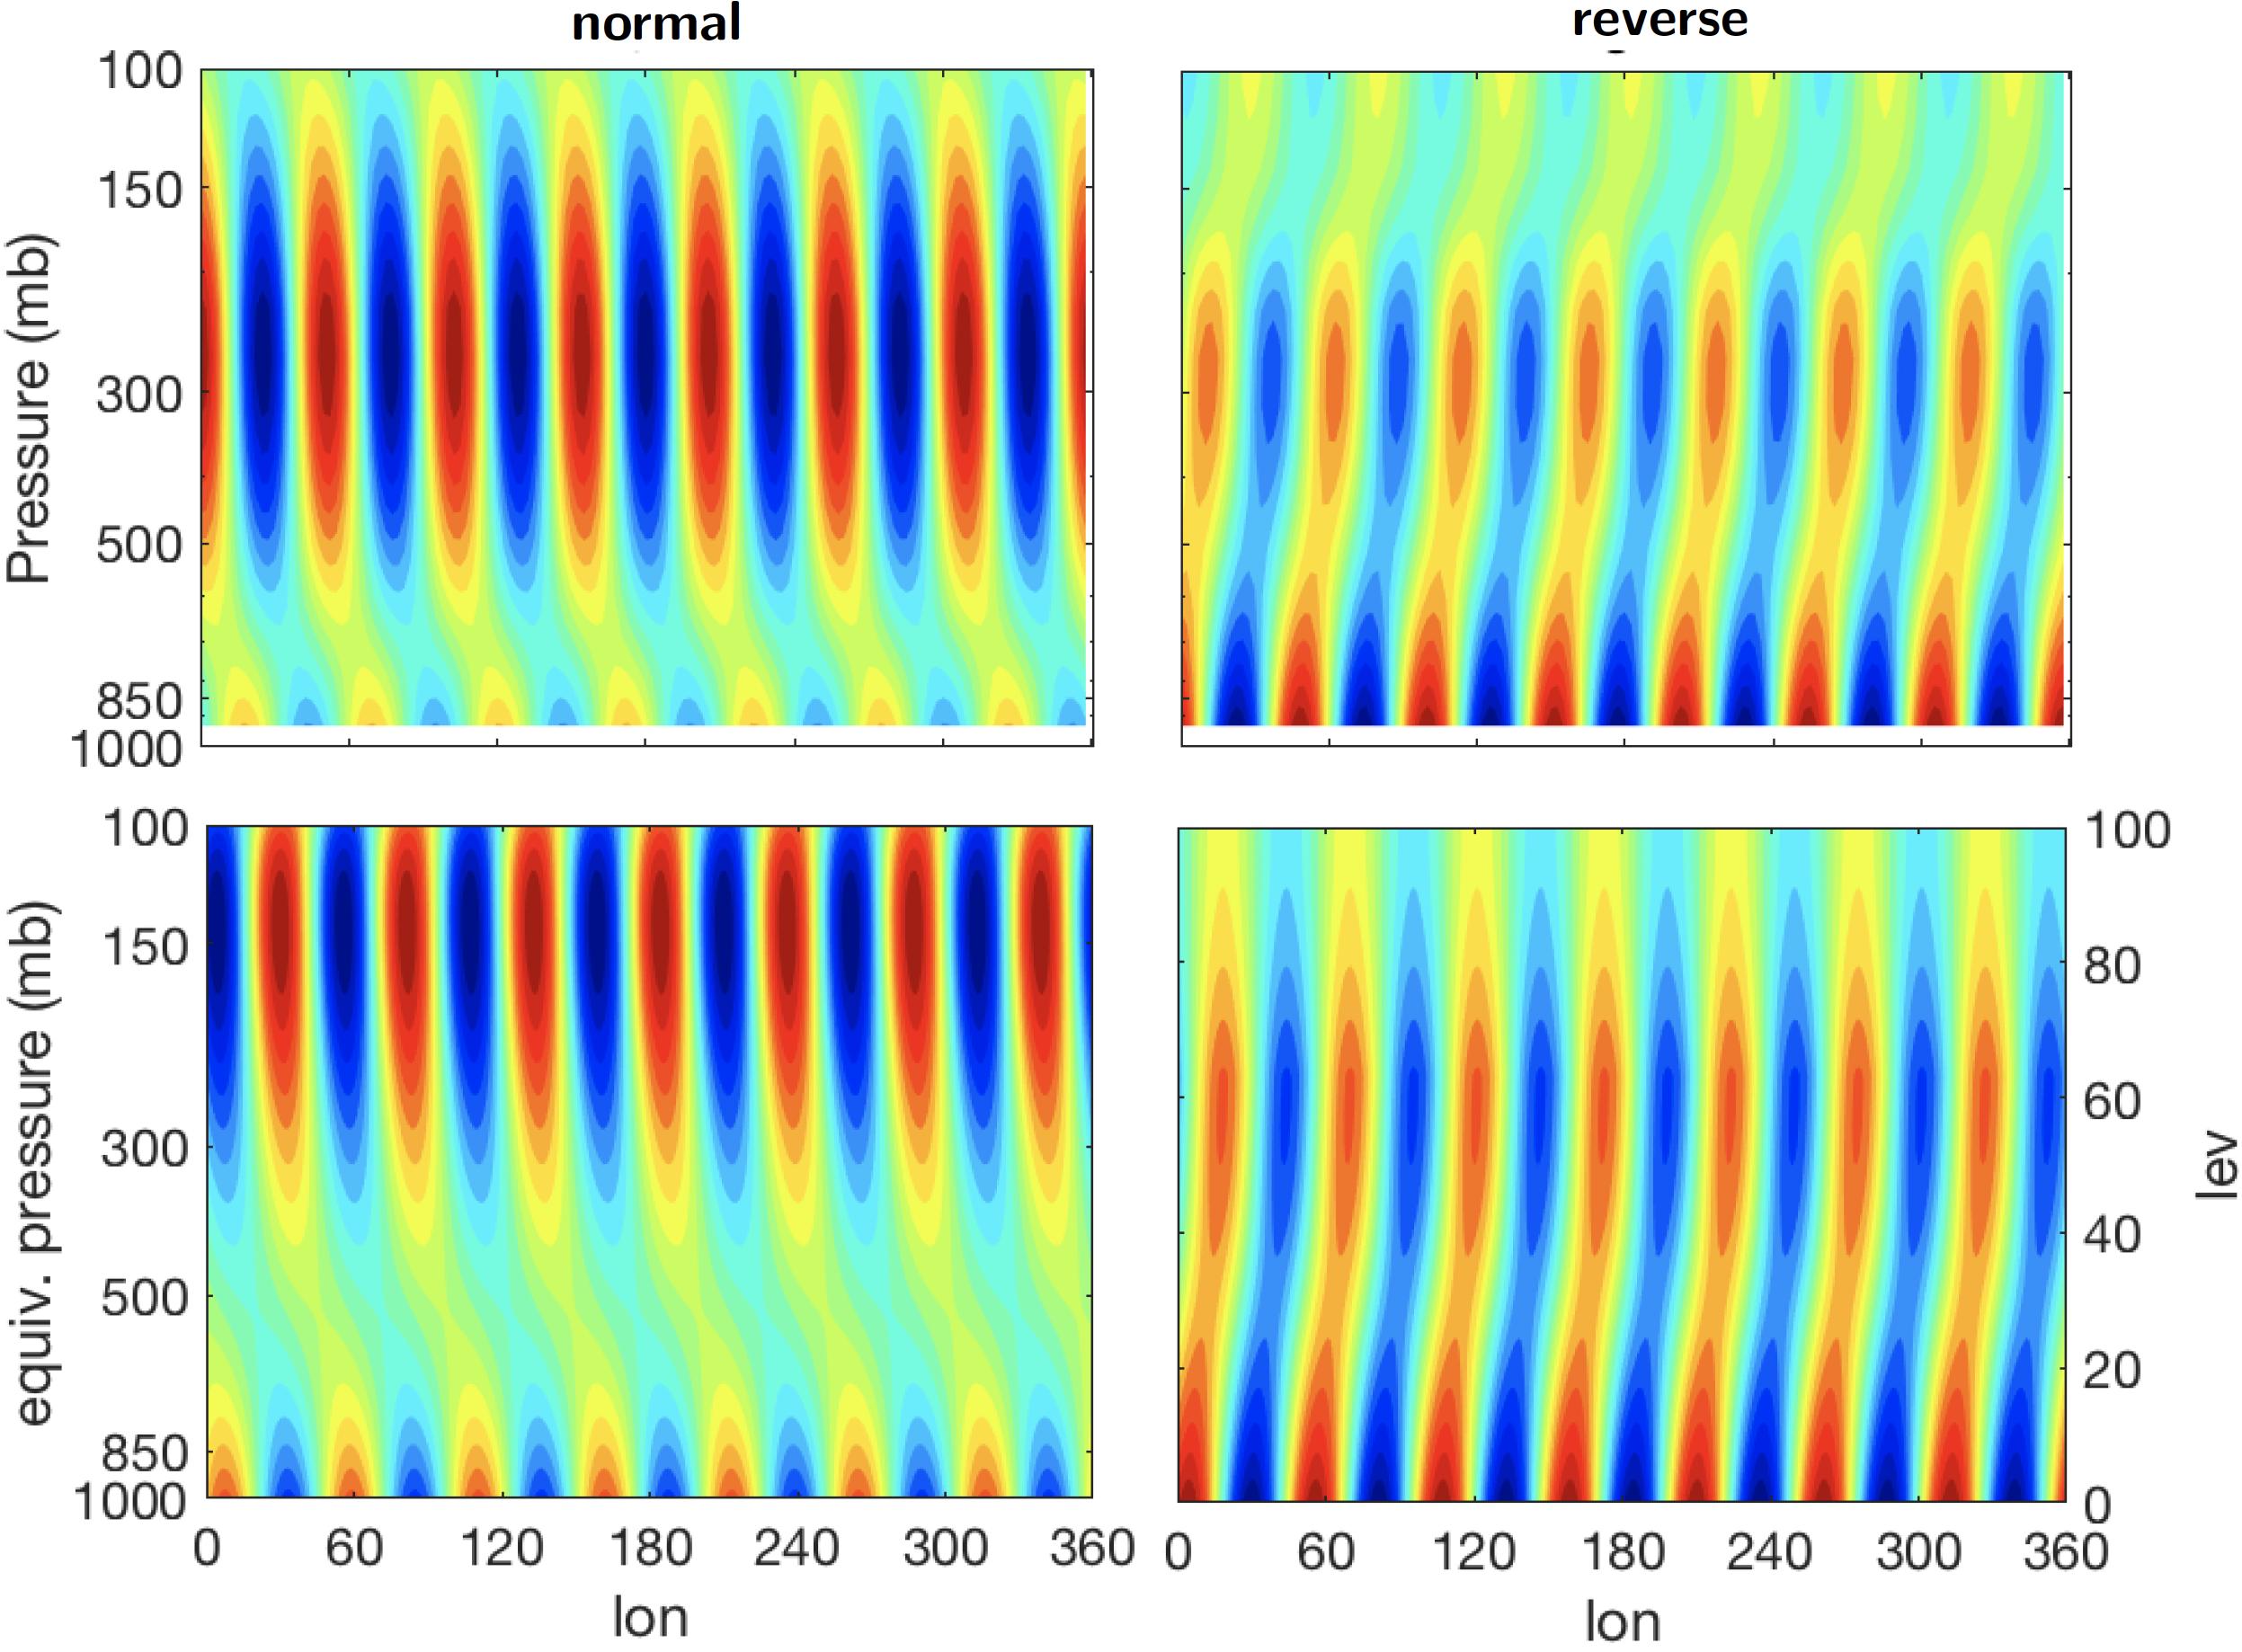 baroclinic-unstable-mode-normal-reverse-gradient